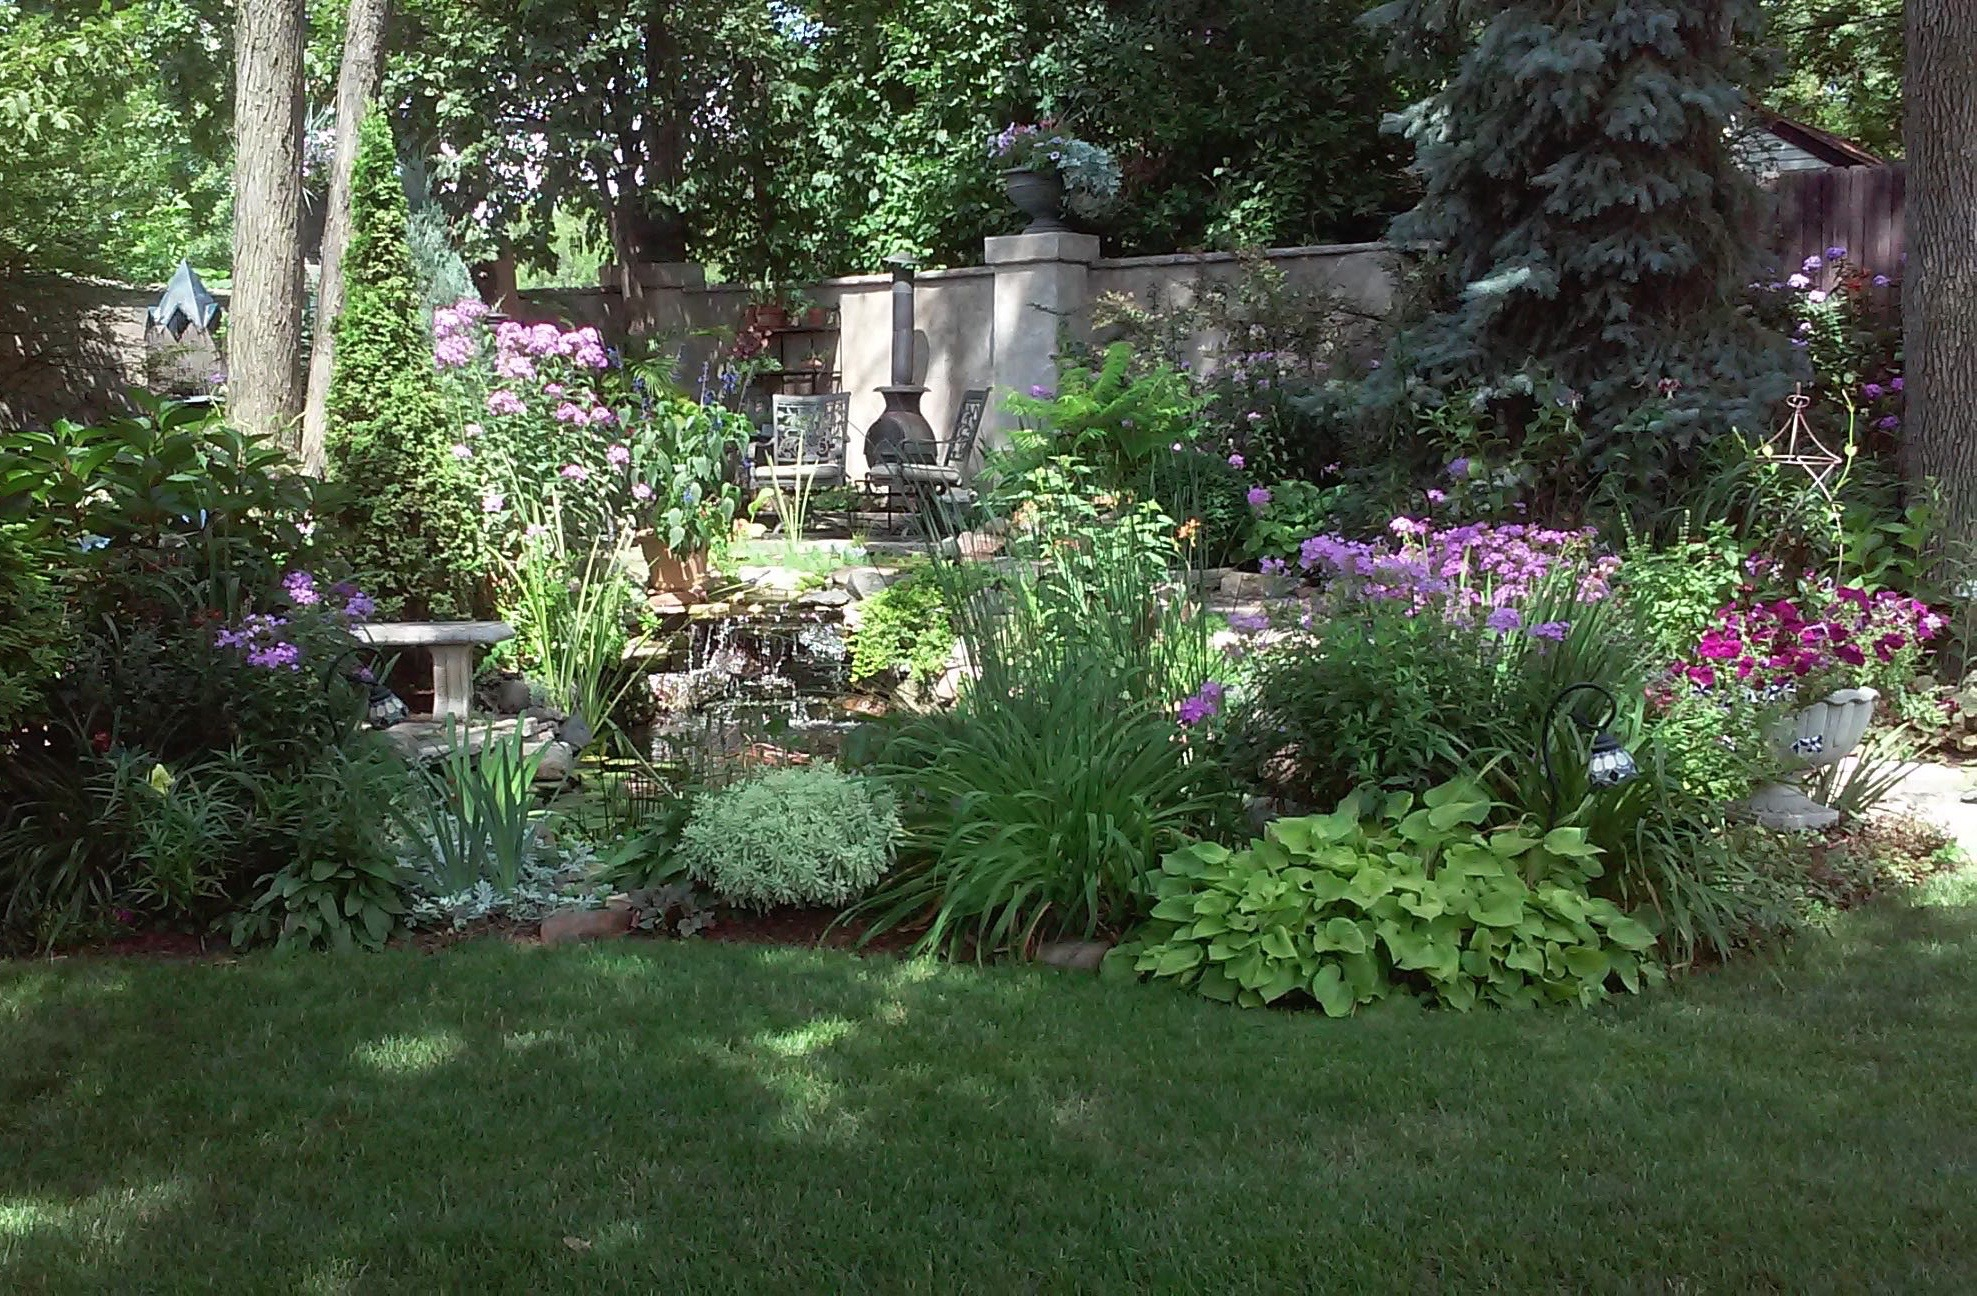 backyard garden and sitting area